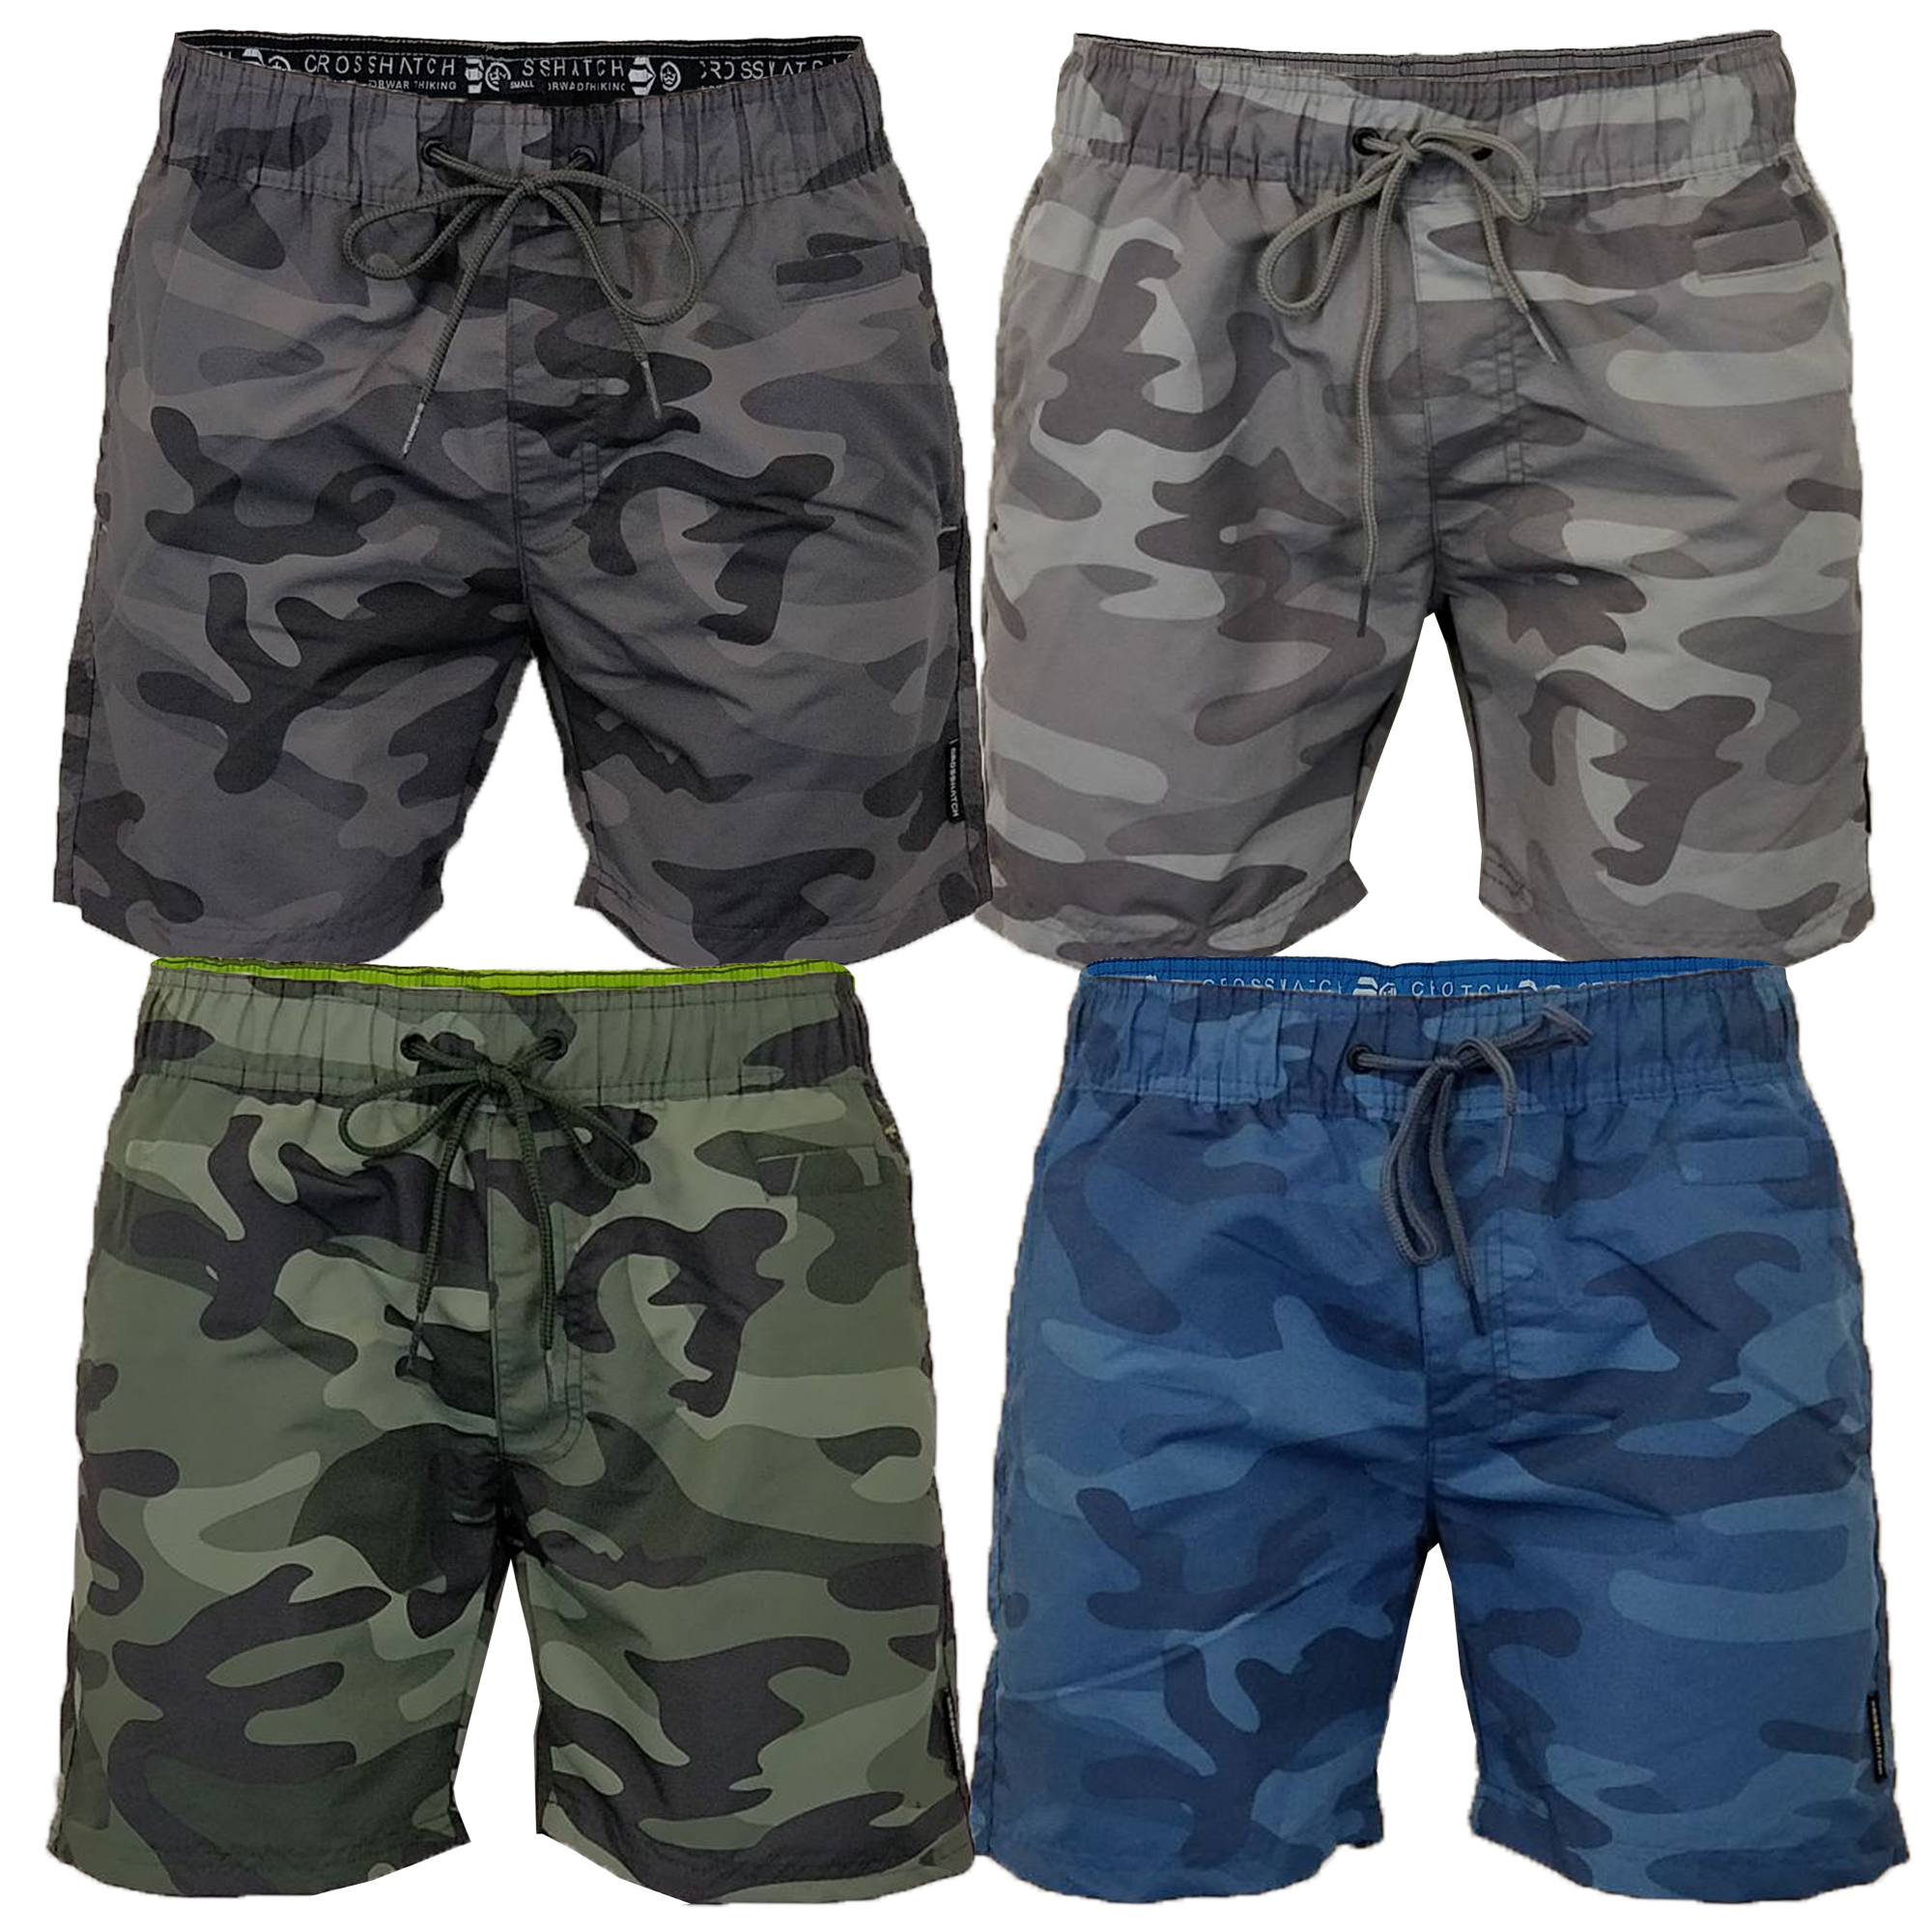 954d0c9ae2 Mens Camouflage Swim Shorts Crosshatch Army Camoswim Military Knee ...